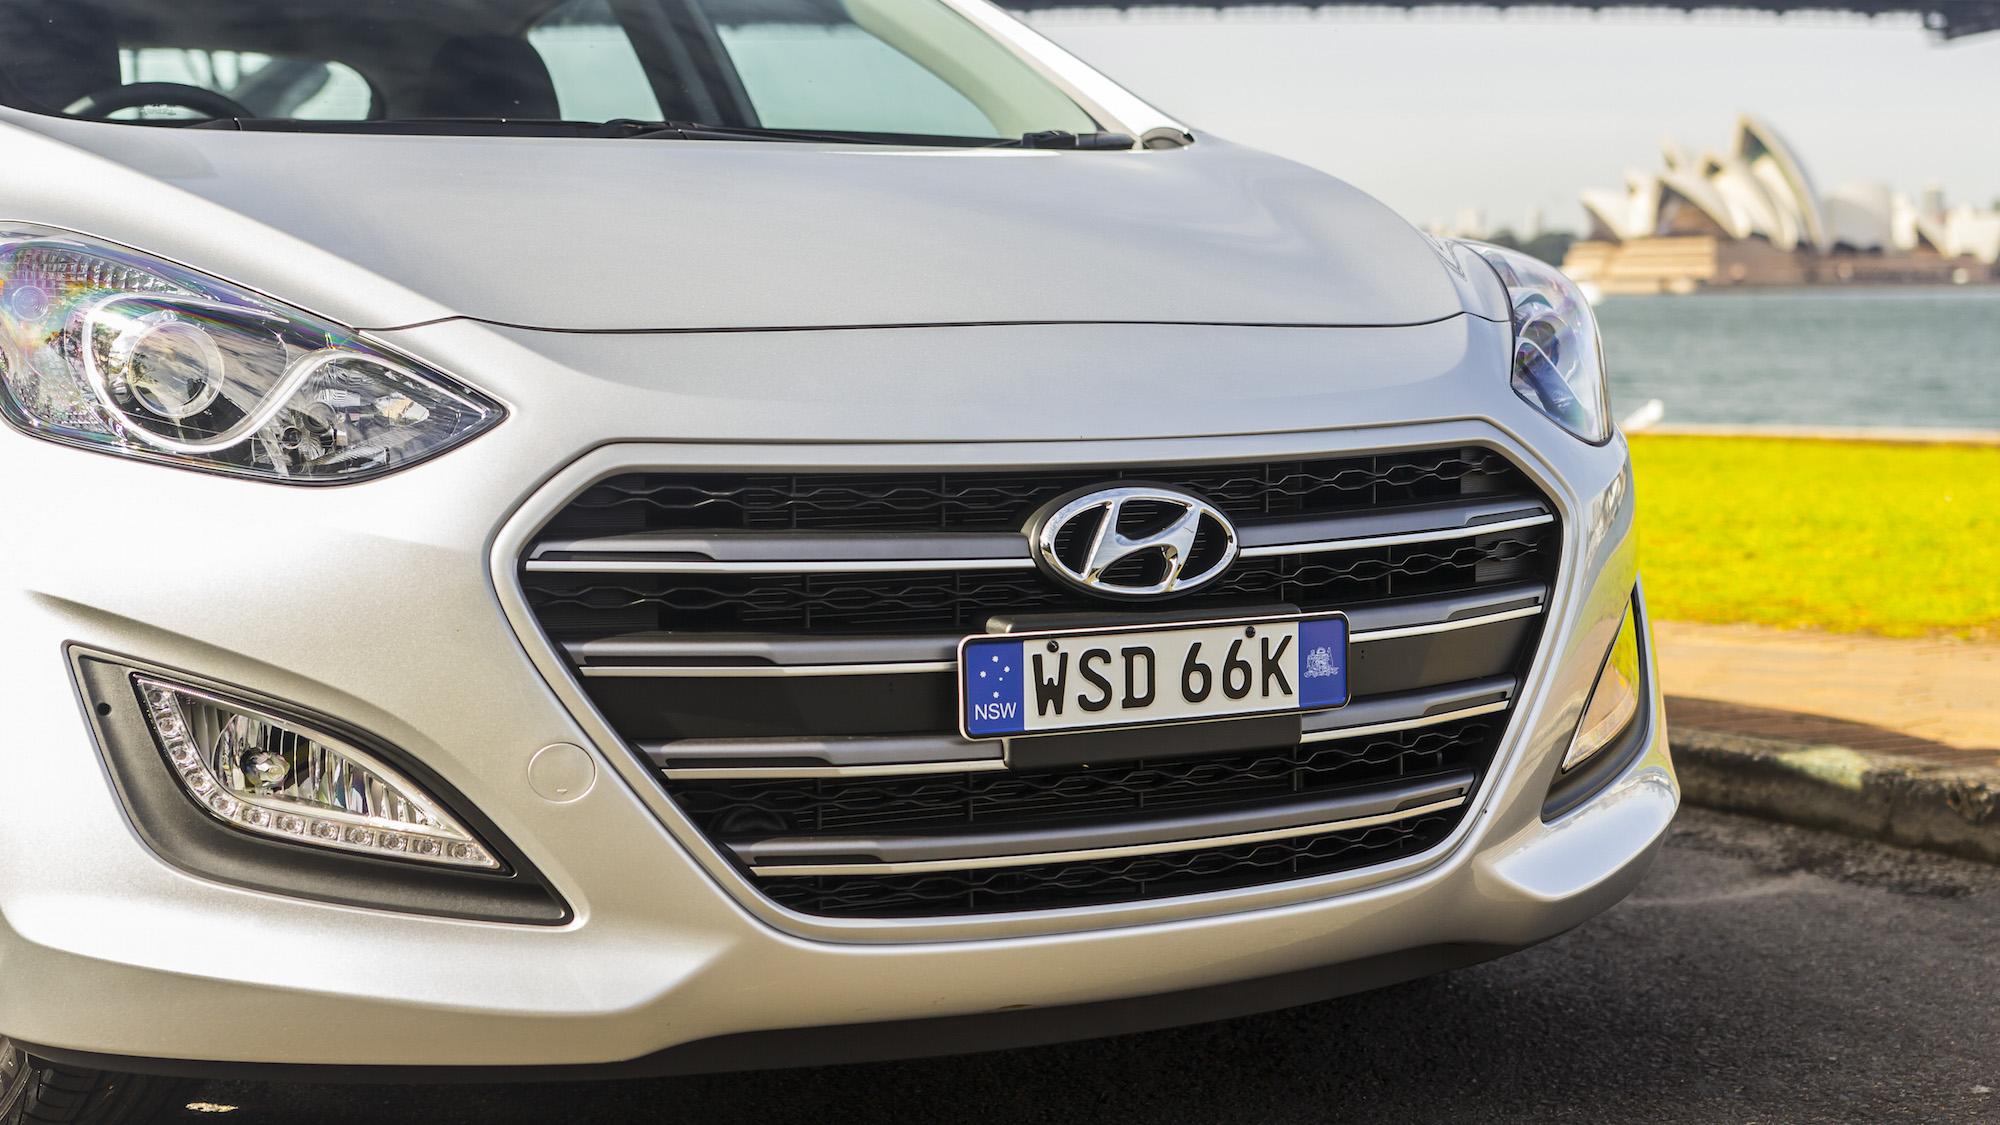 Mazda Carplay Update >> 2016 Hyundai i30, Tucson, Santa Fe pick up Apple CarPlay in Australia - UPDATE - Photos (1 of 5)